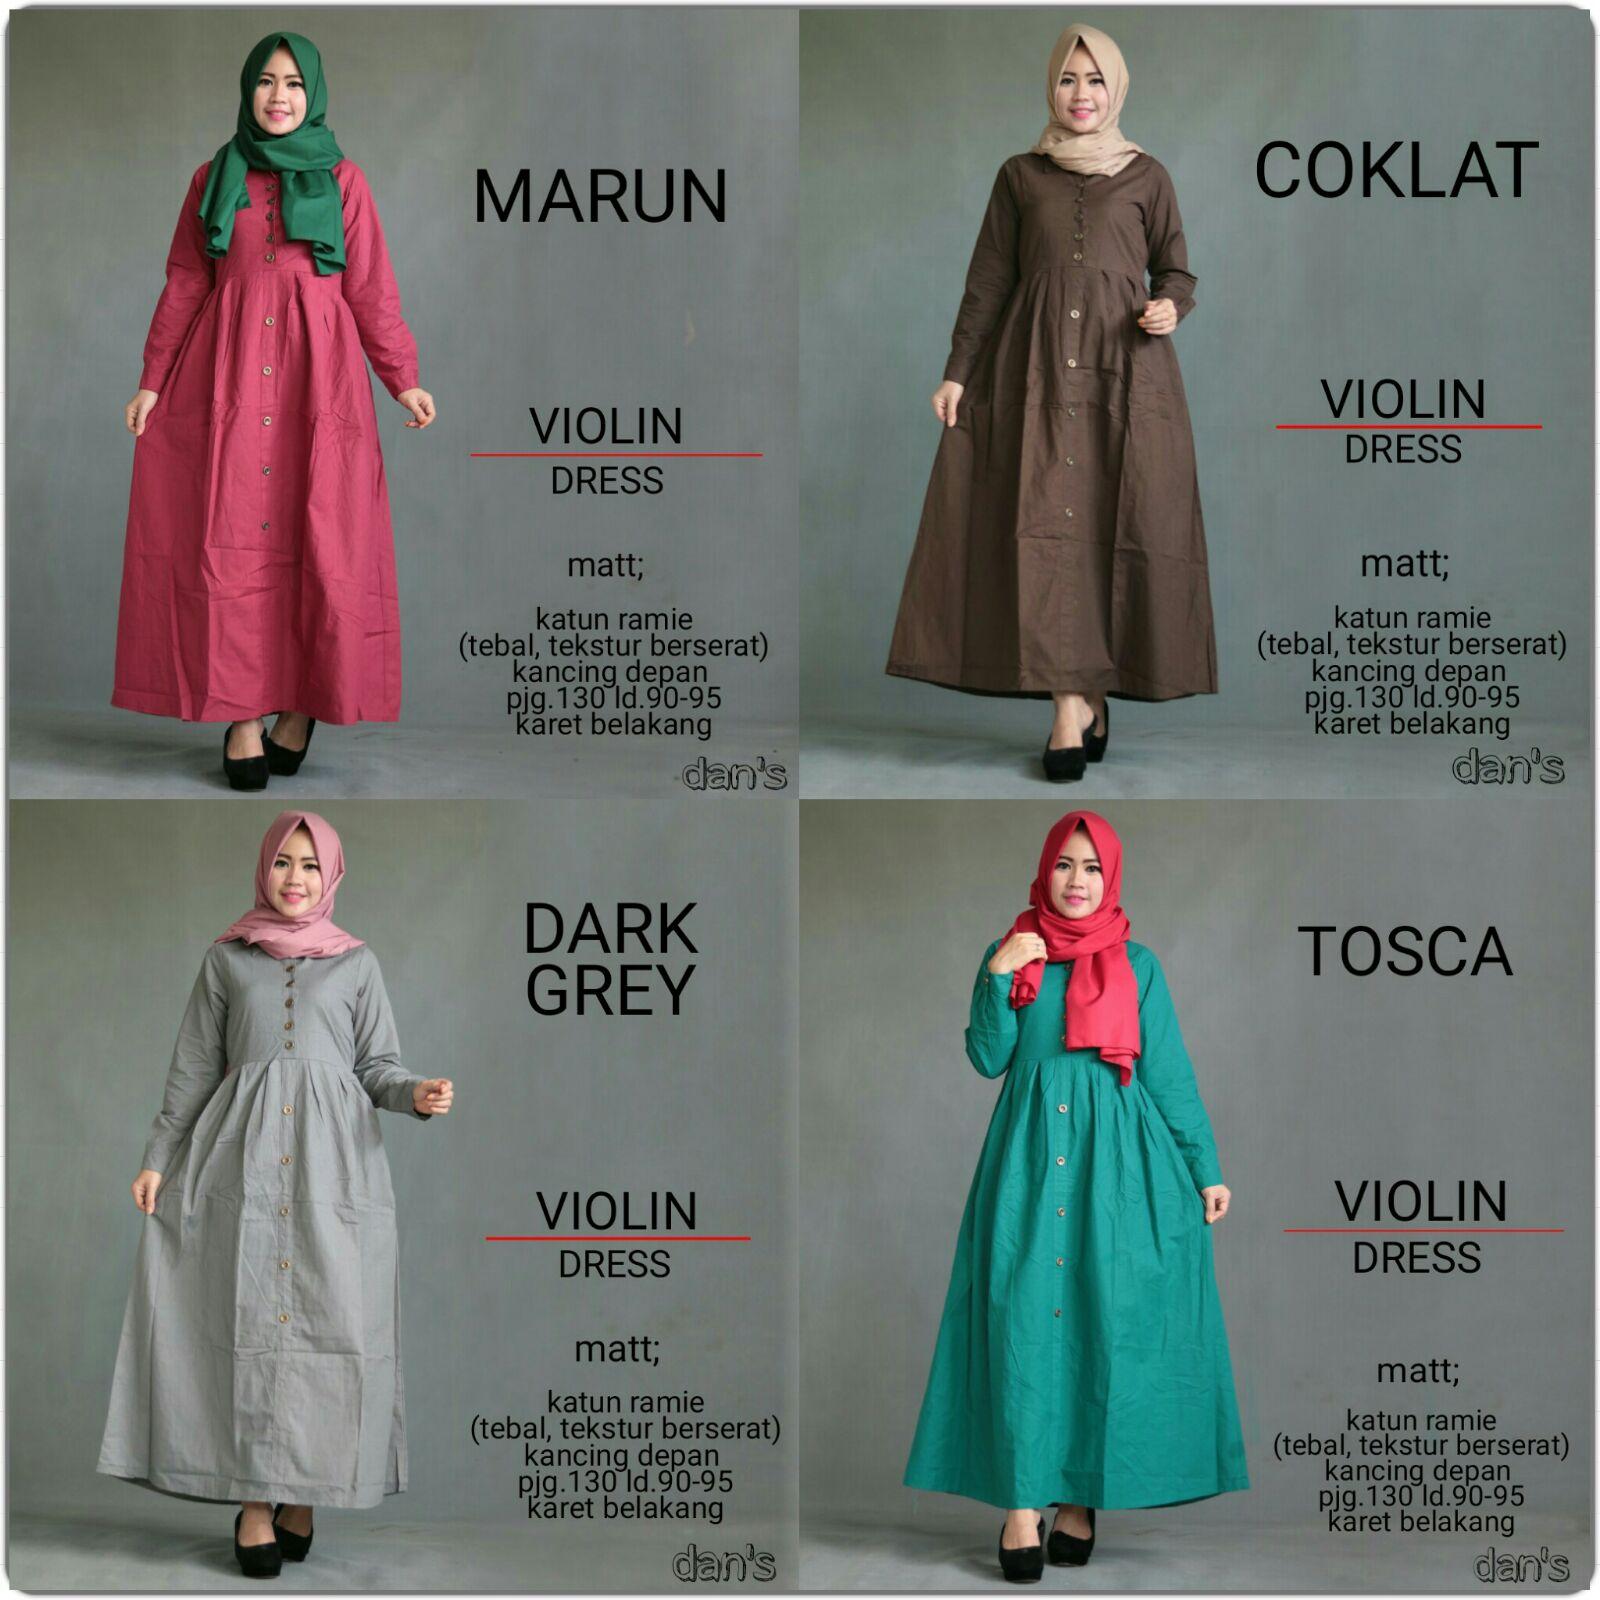 Jual Dans Violin Busana Muslim Gamis Katun Kaos Hijab Wanita Syari Baju Dress